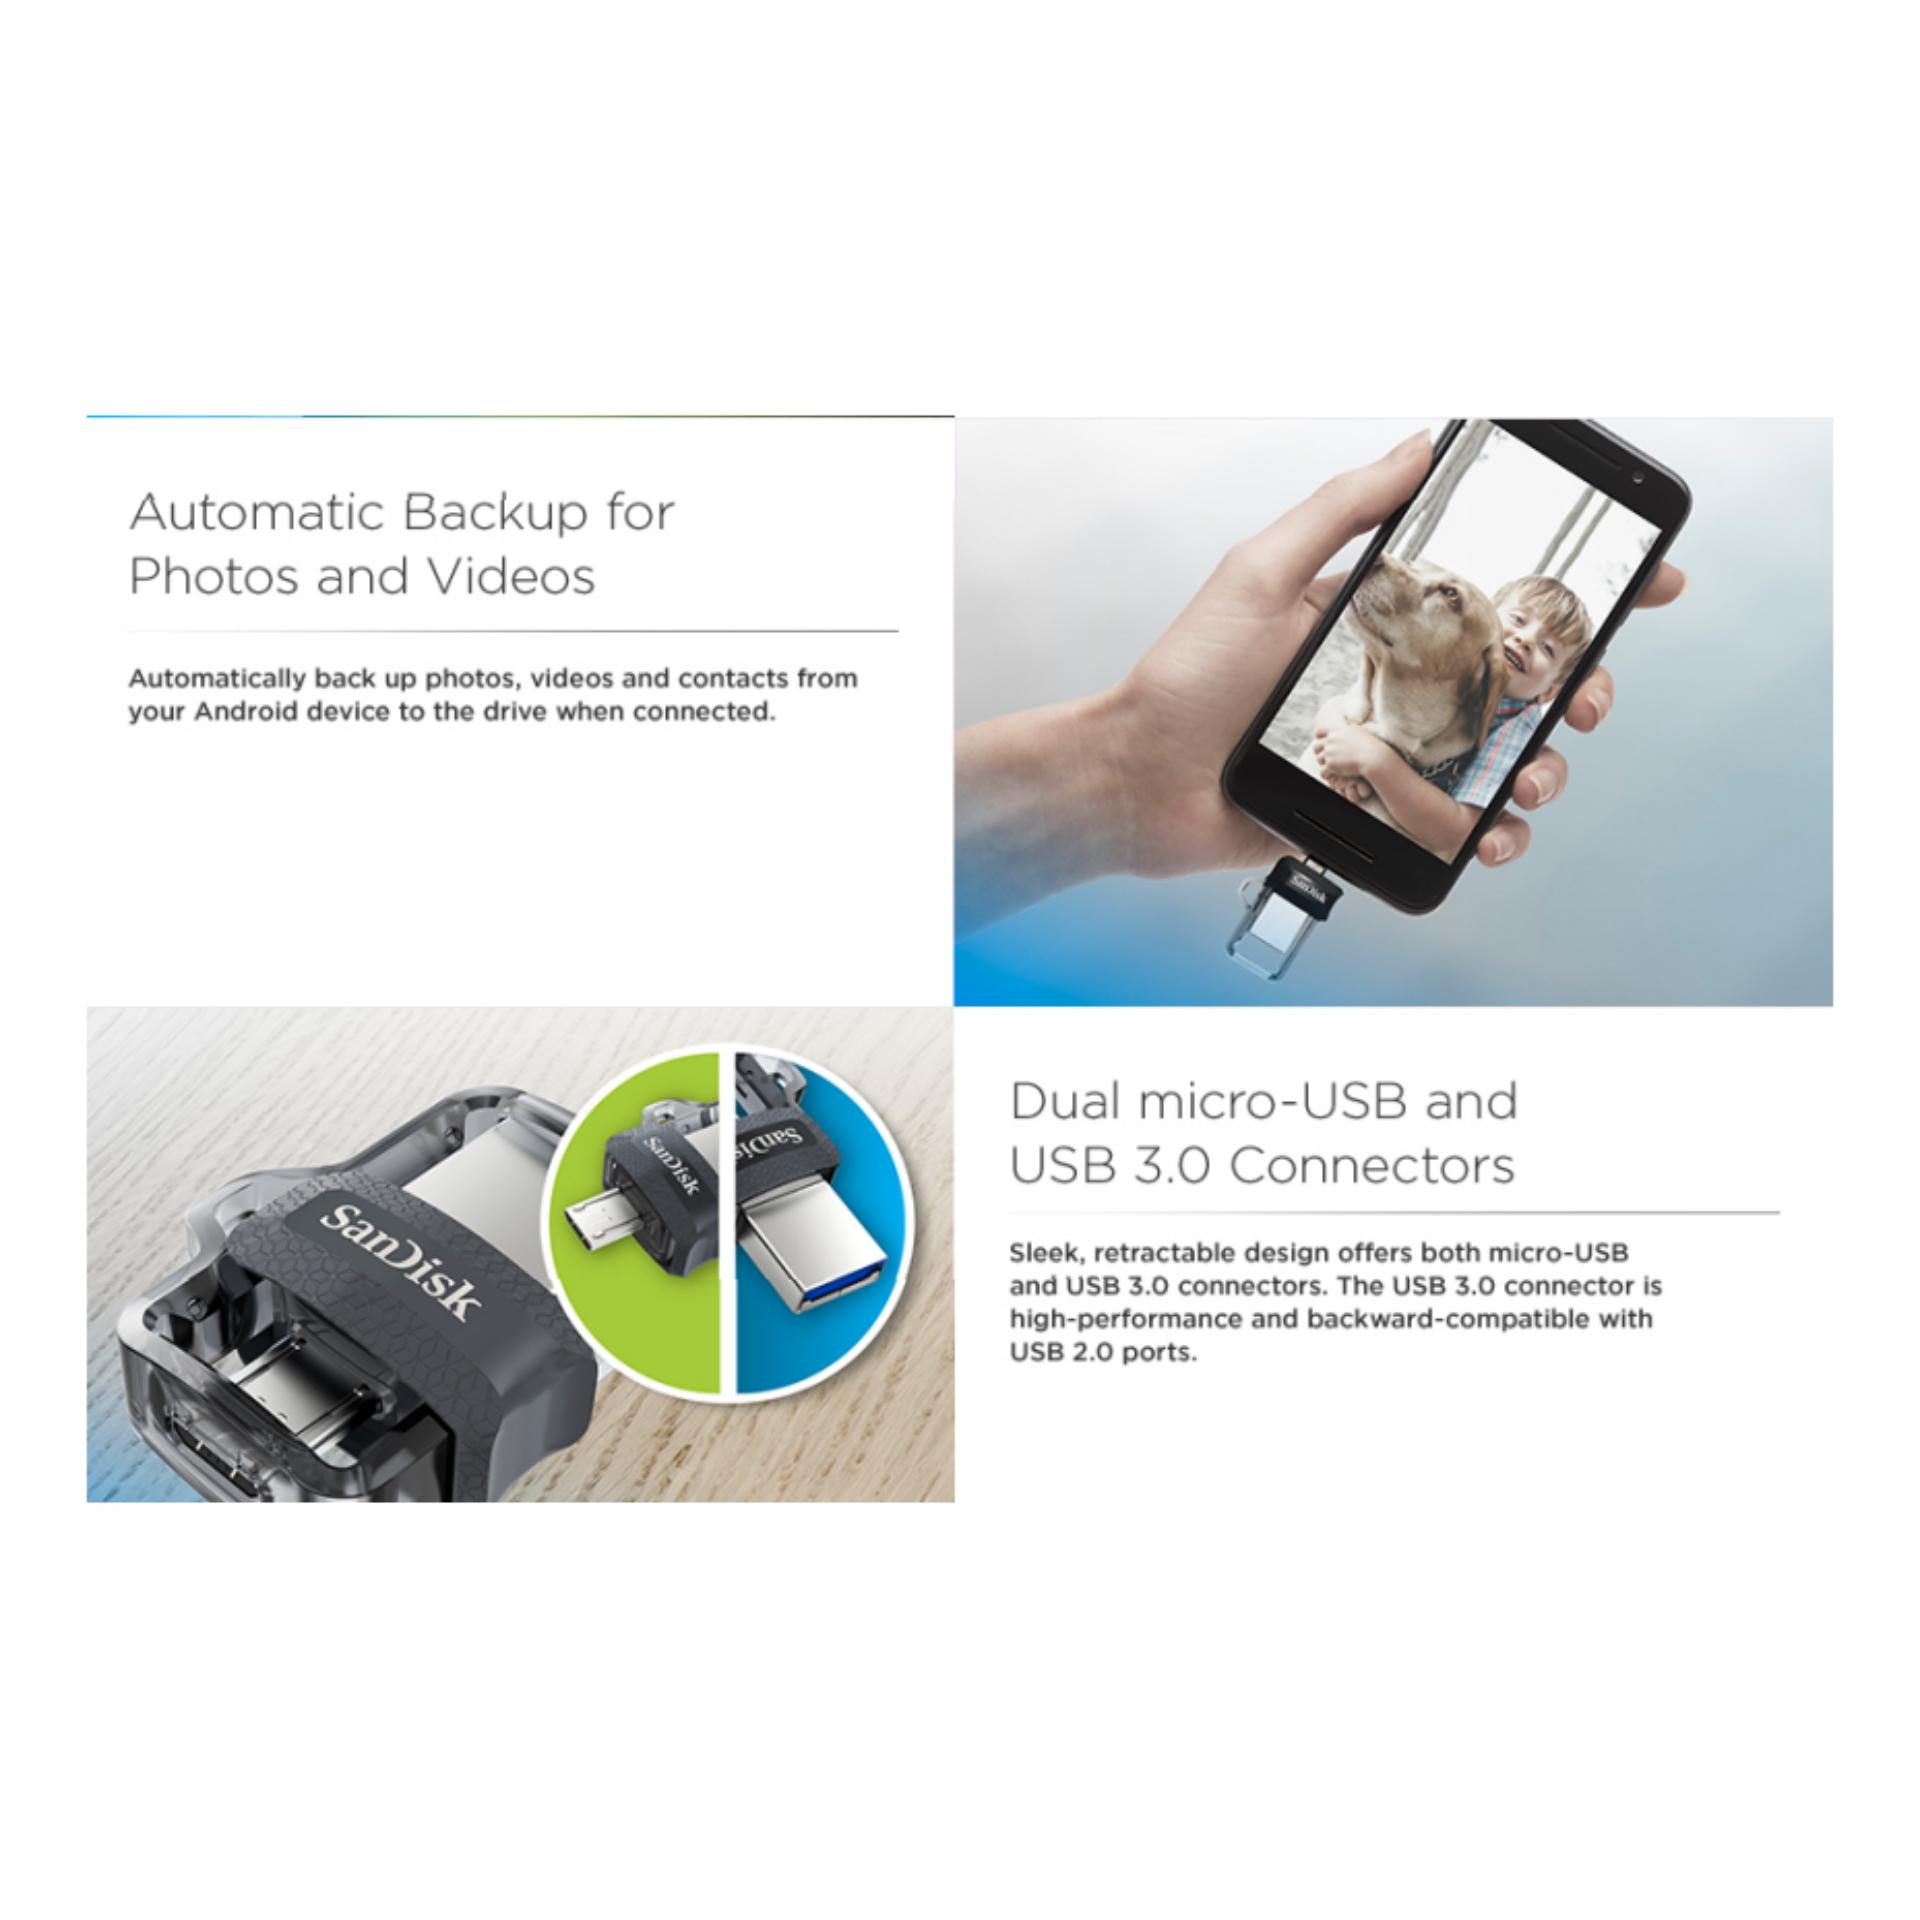 Philippines Sandisk Ultra Sddd3 016g 16gb Otg Dual Usb Drive M3 30 M30 Translucent